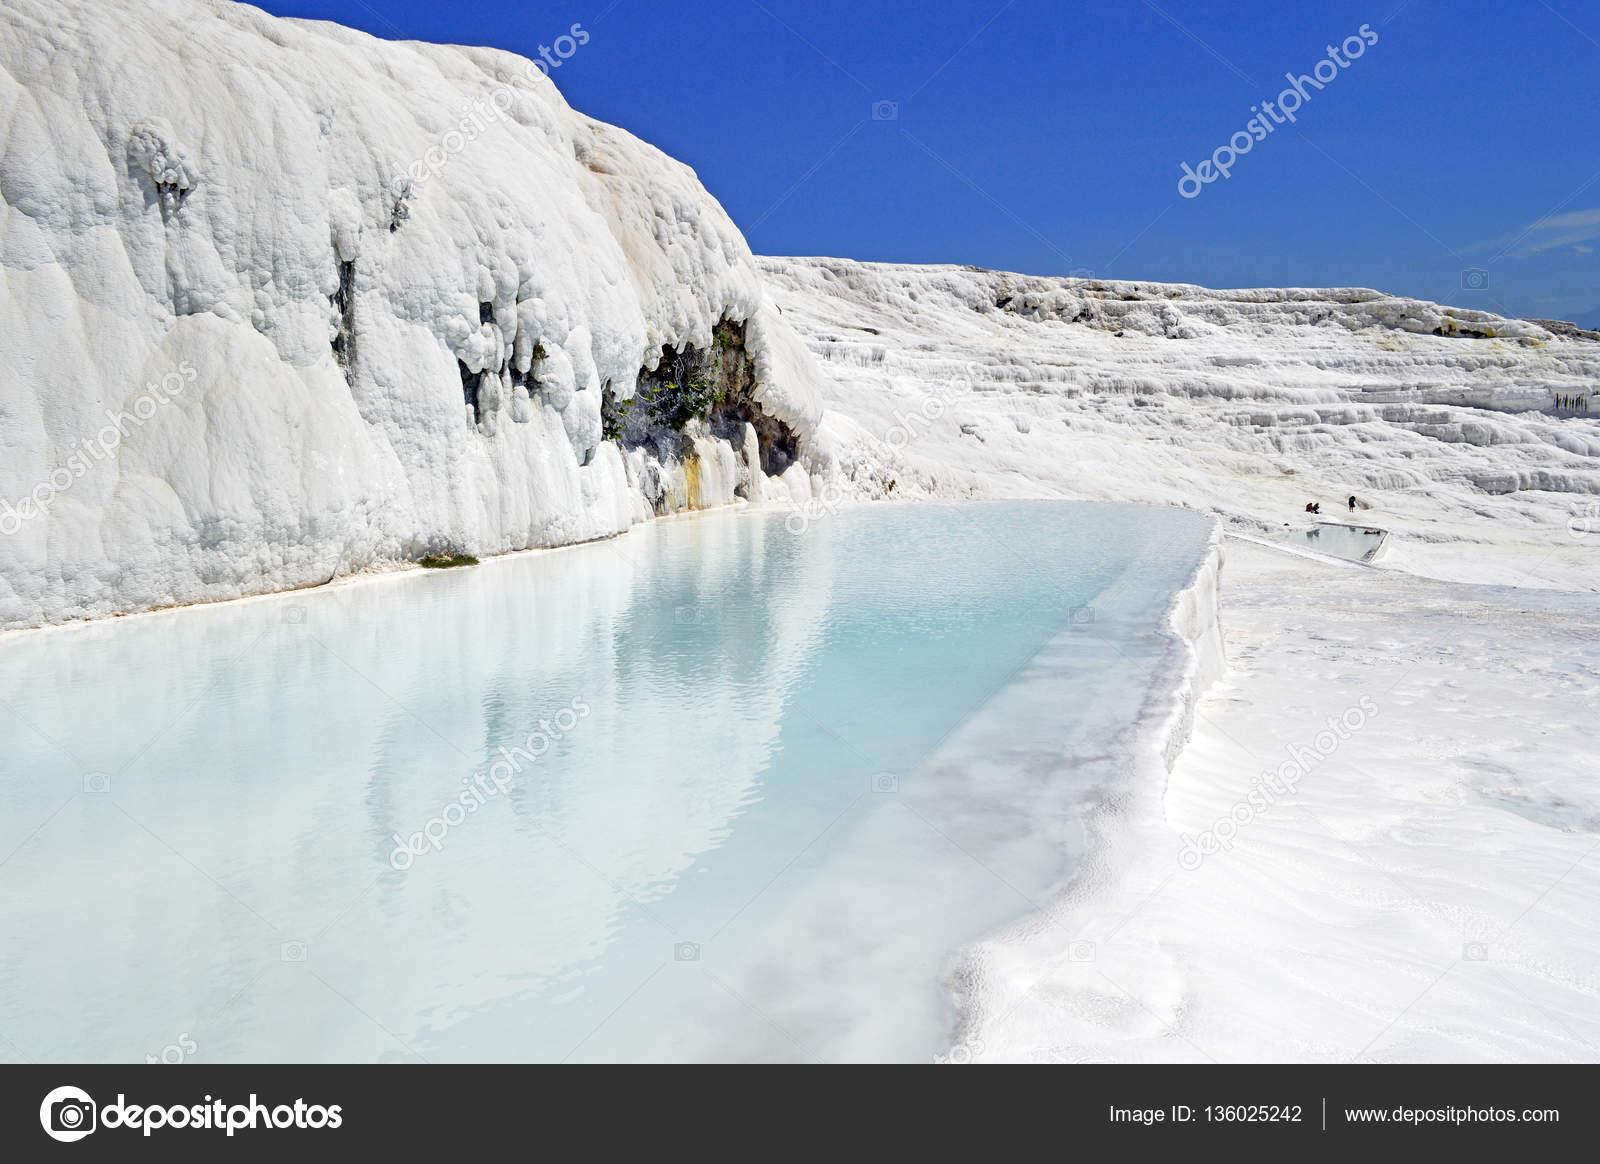 https://st3.depositphotos.com/10626946/13602/i/1600/depositphotos_136025242-stock-photo-mineral-springs-of-pamukkale-turkey.jpg